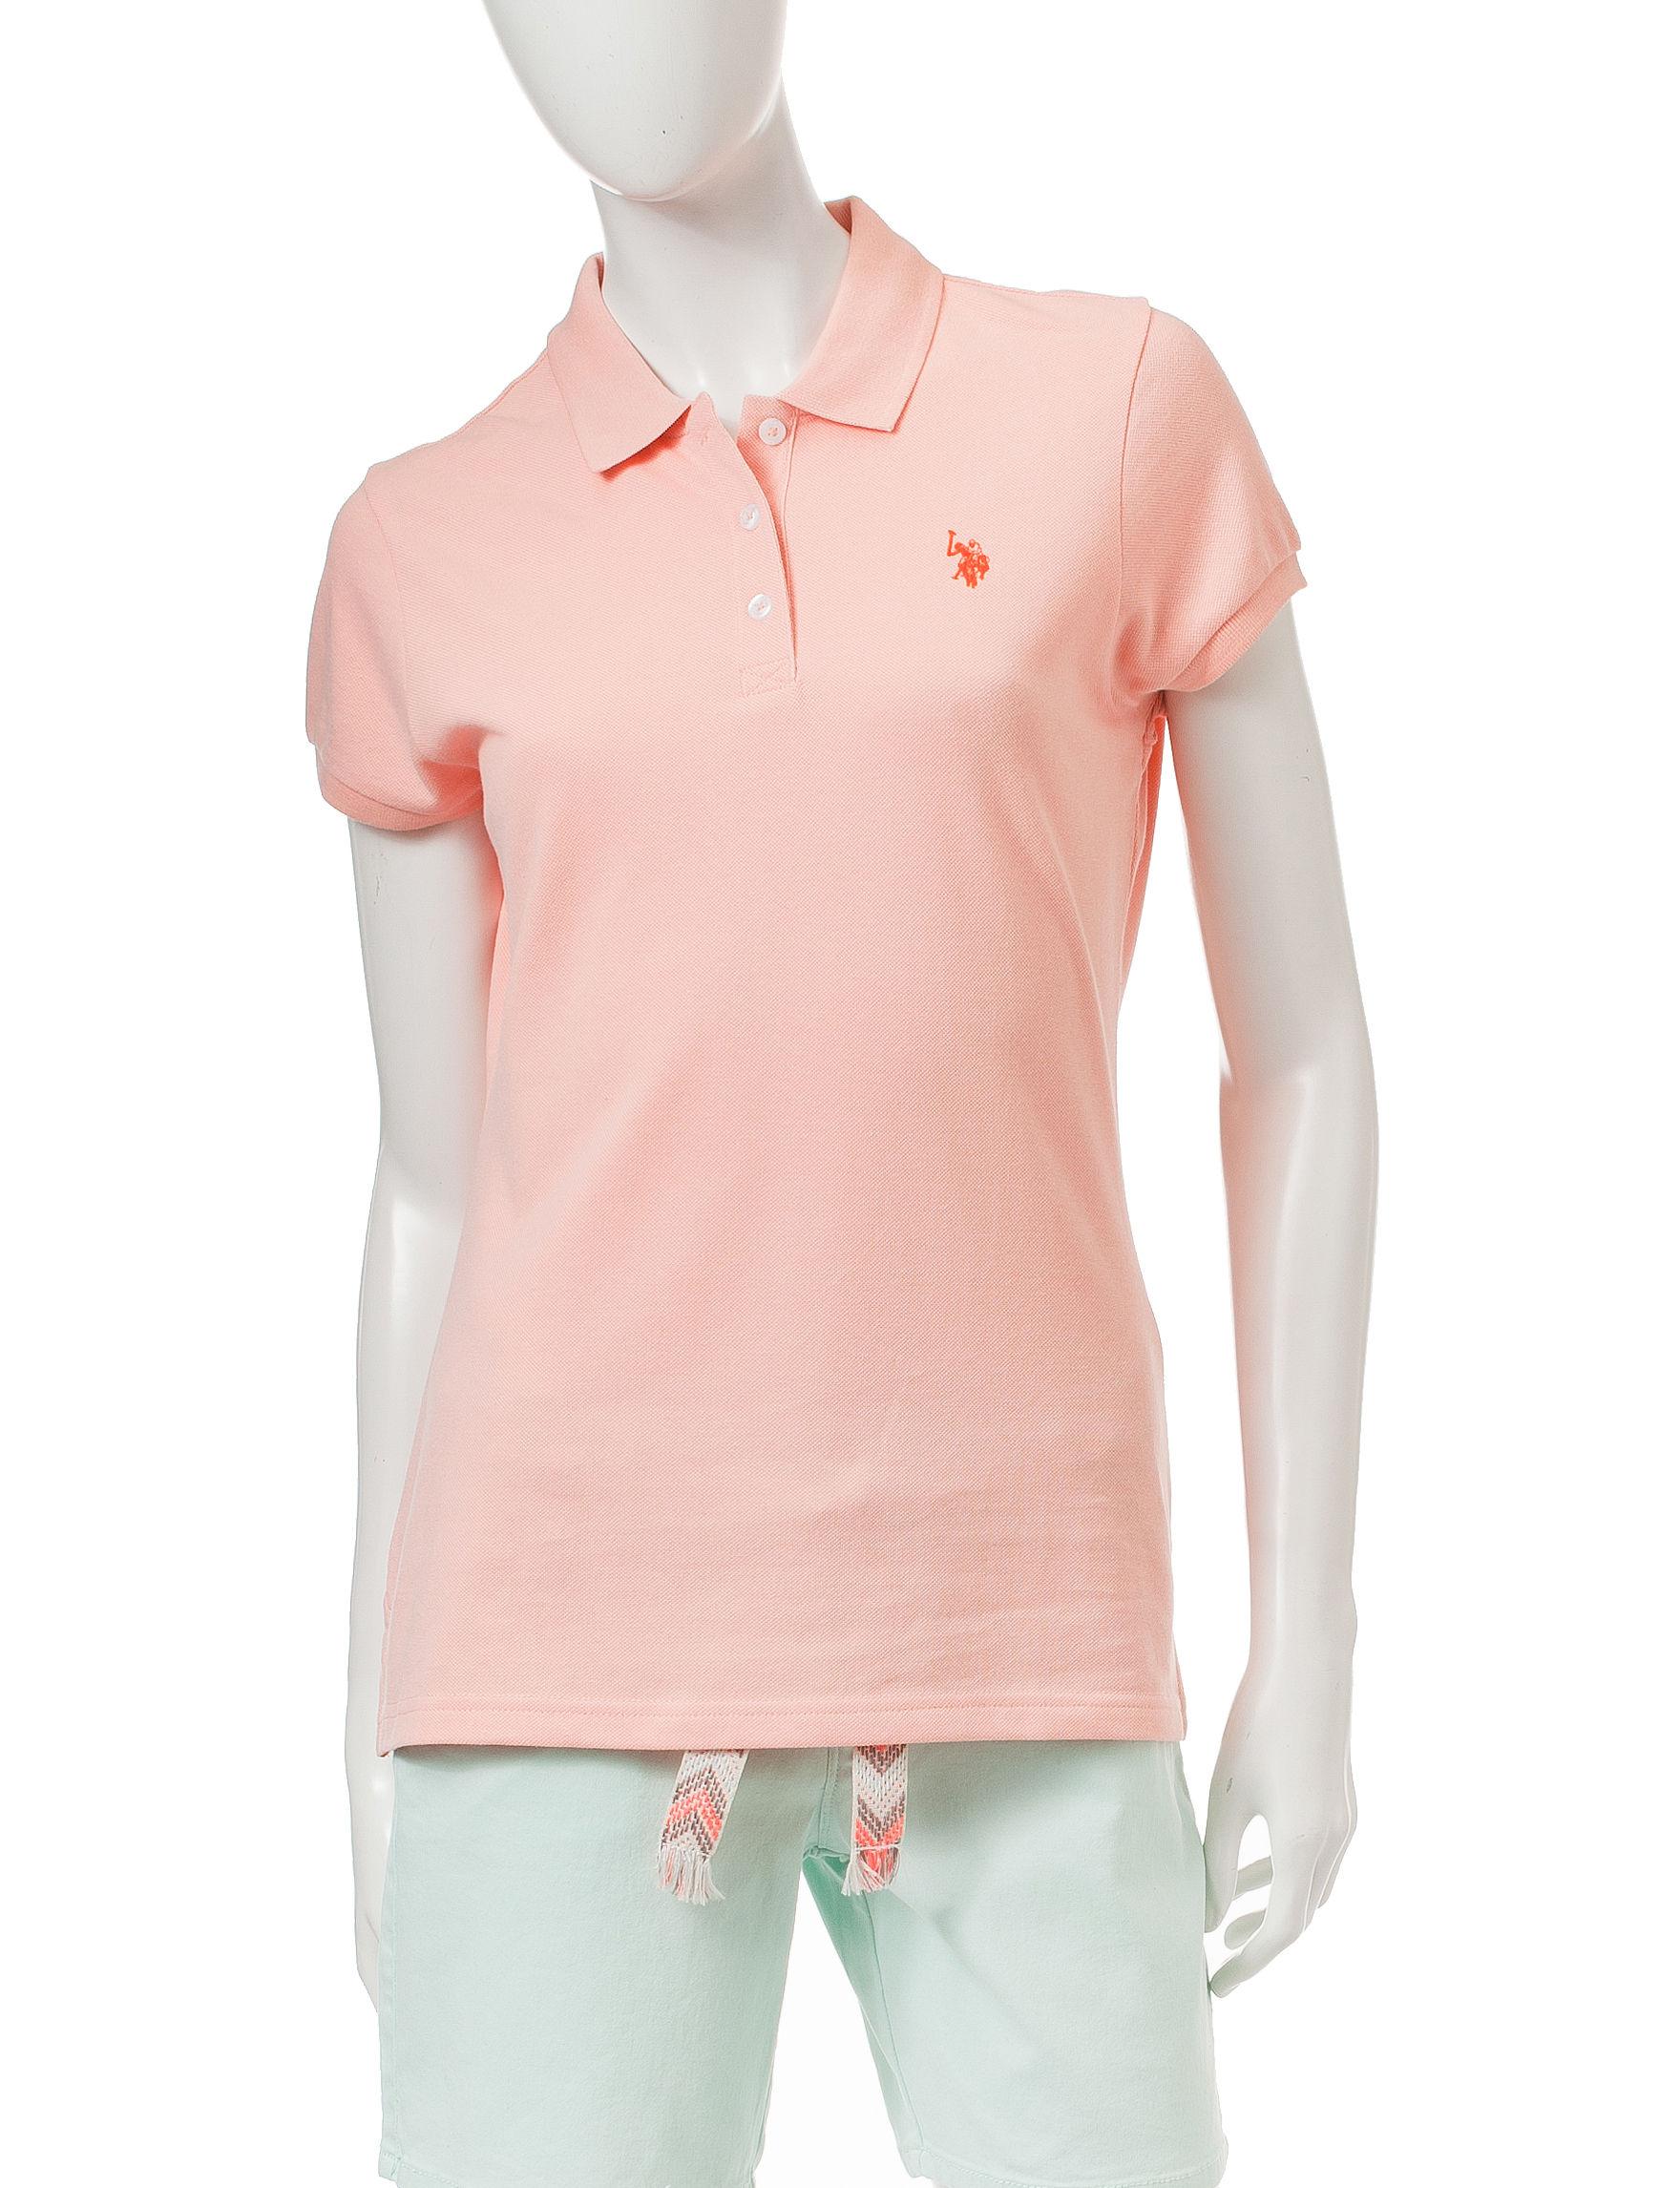 U.S. Polo Assn. Dark Orange Shirts & Blouses